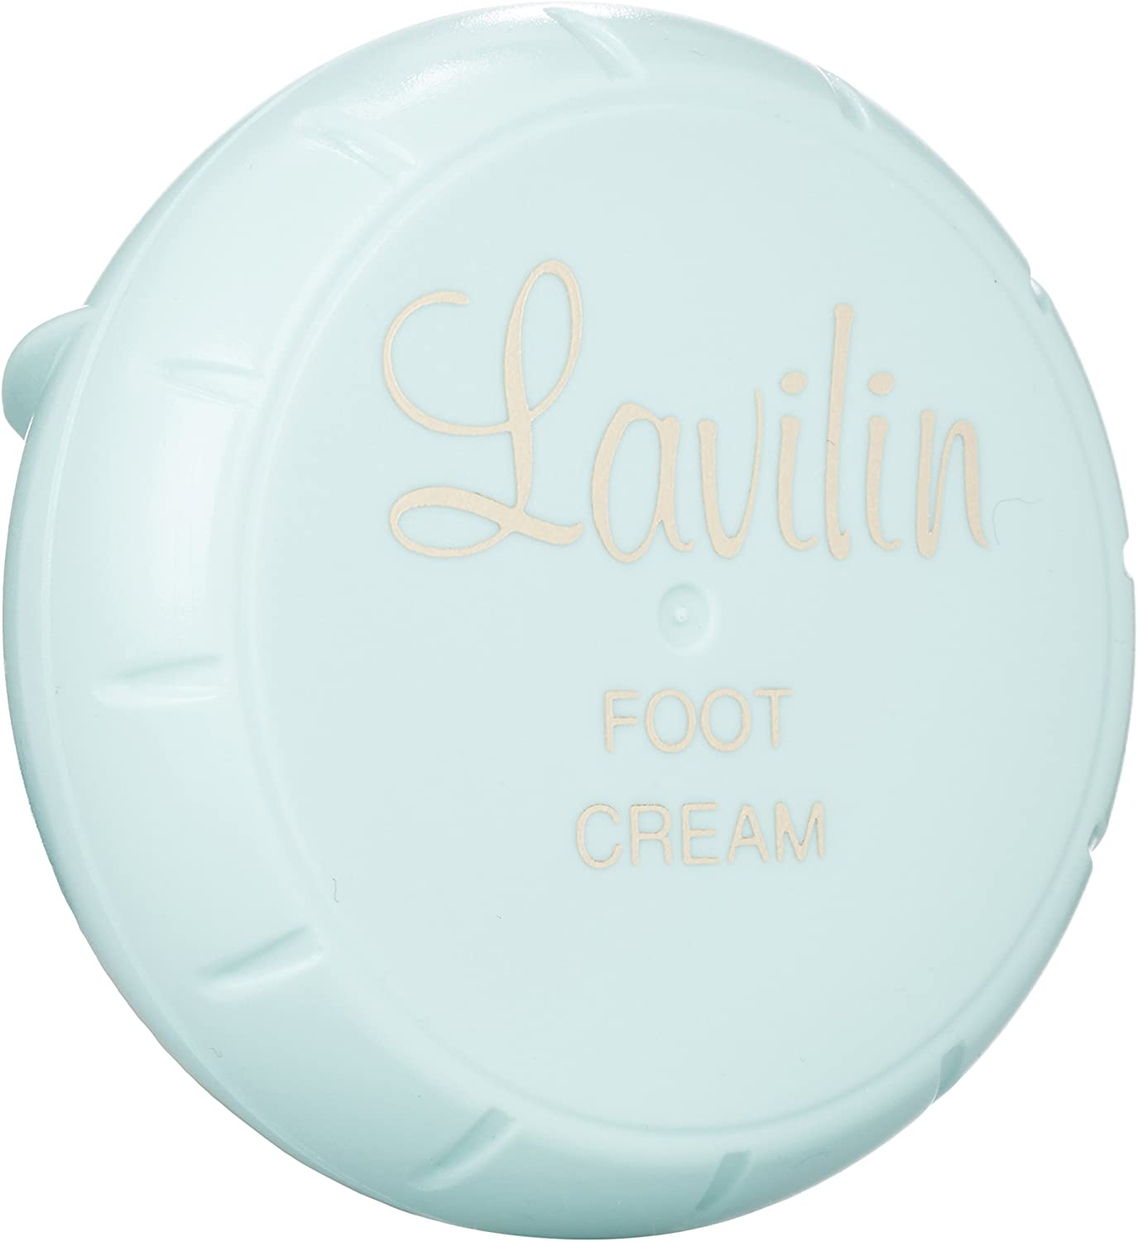 Lavilin(ラヴィリン) フットクリーム